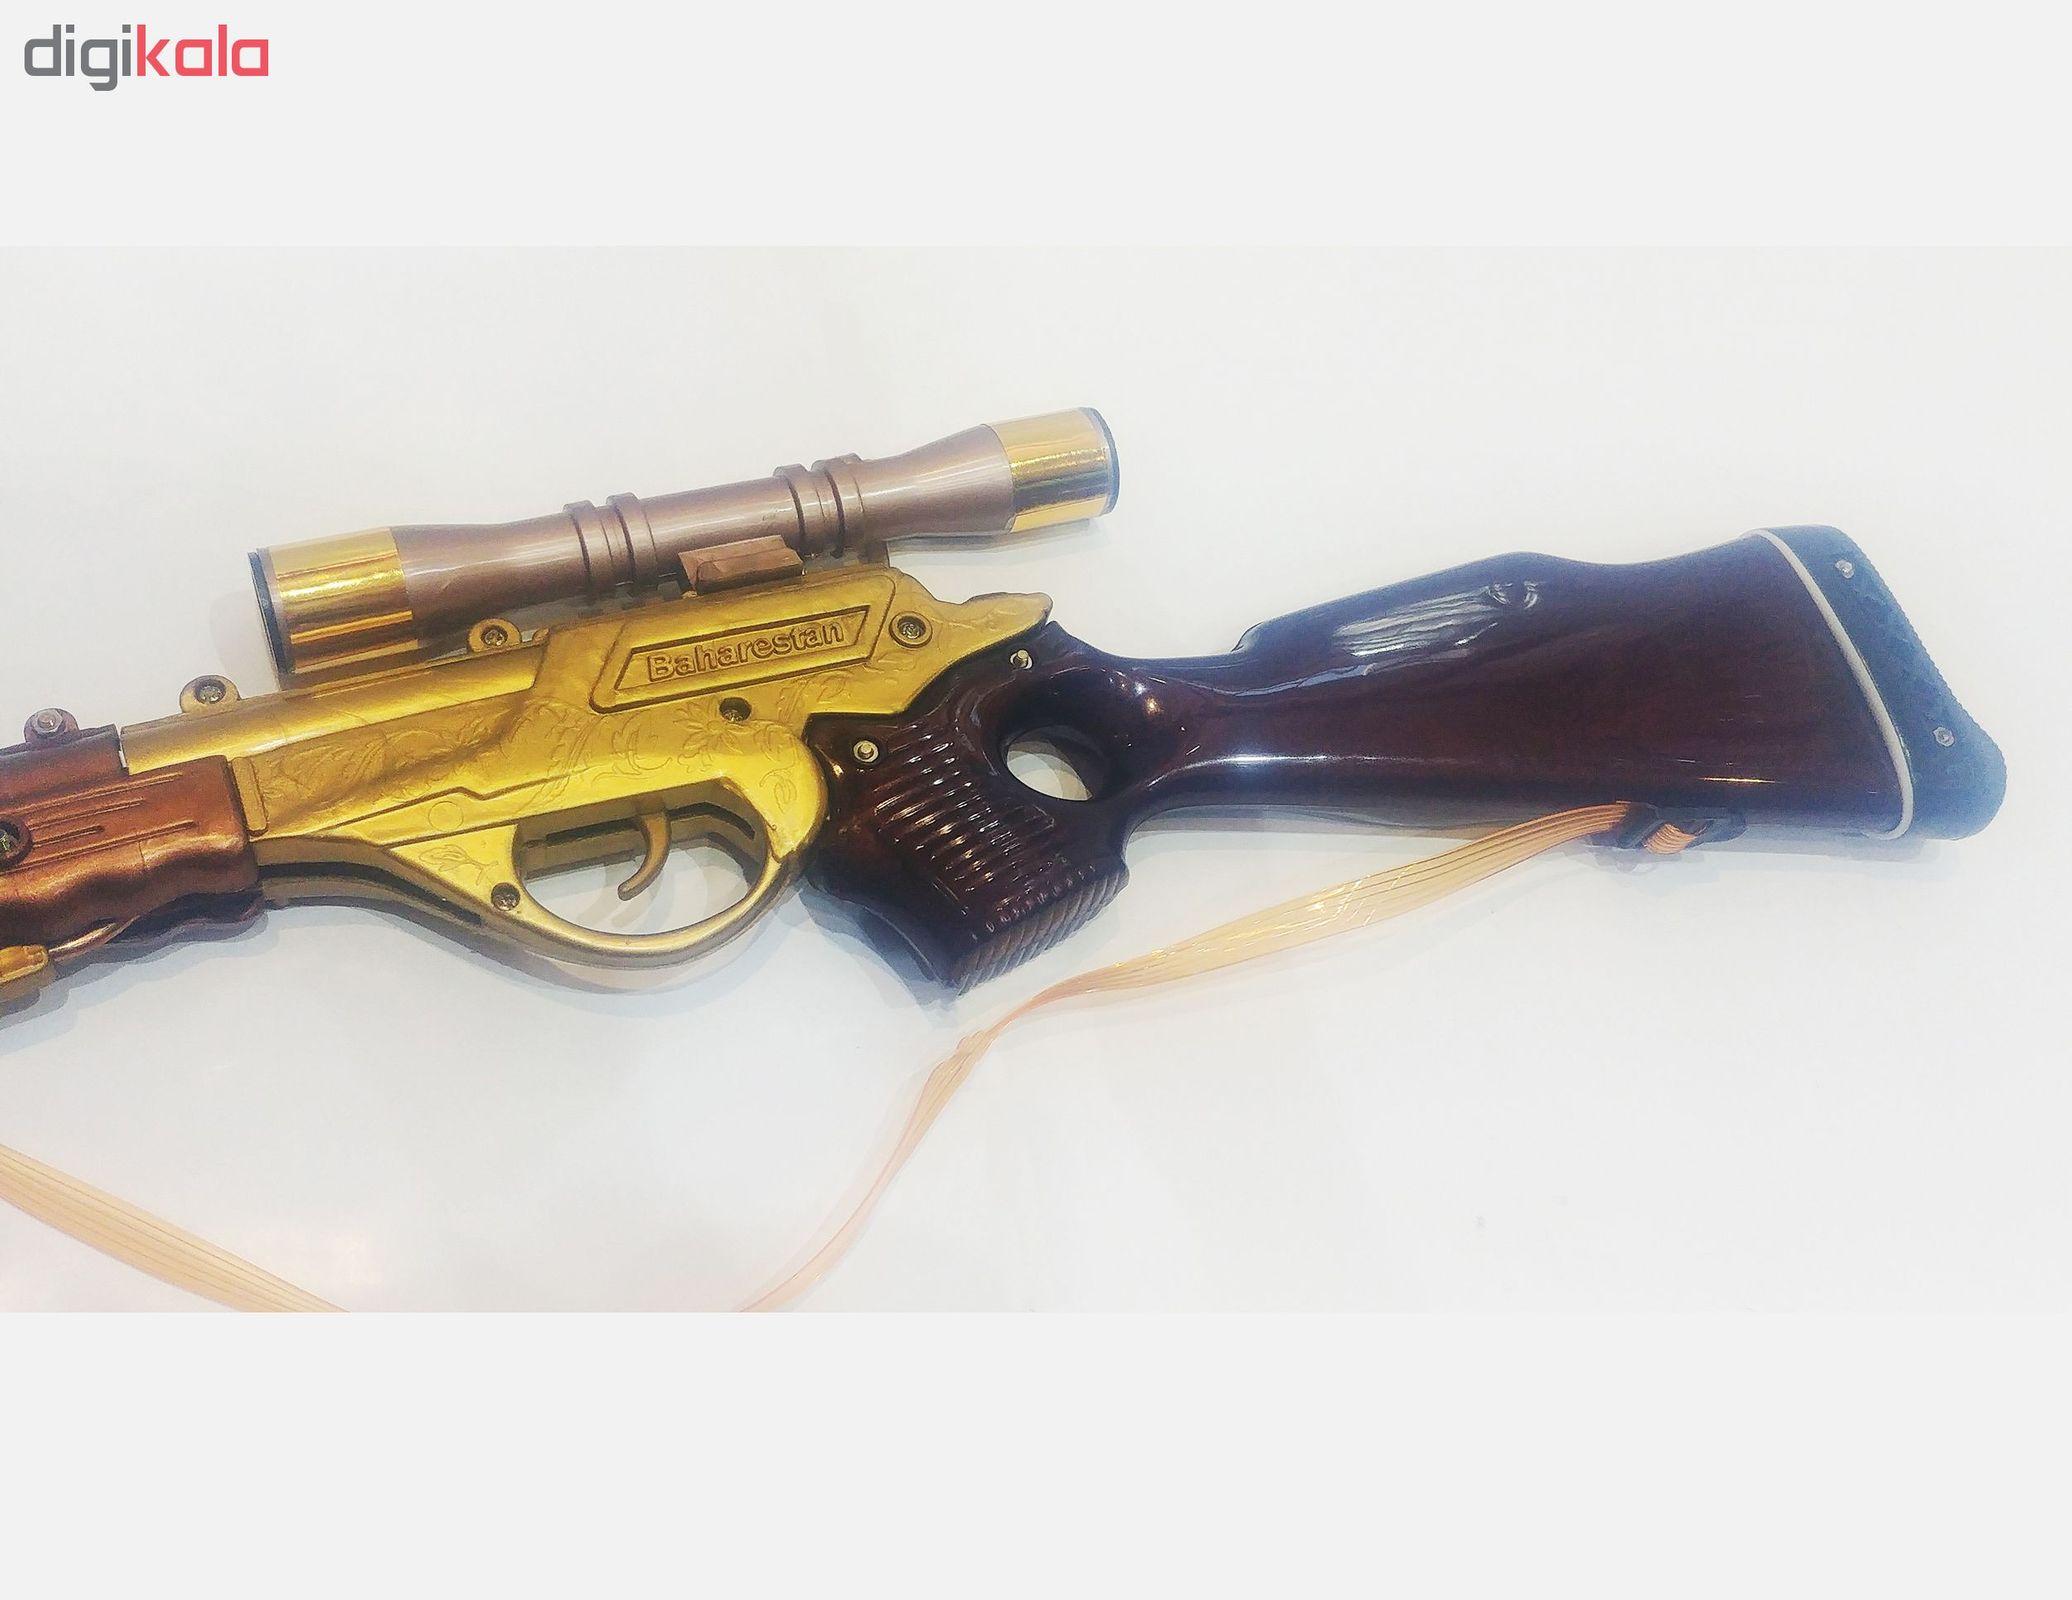 تفنگ بازی مدل Hornet 168 main 1 1